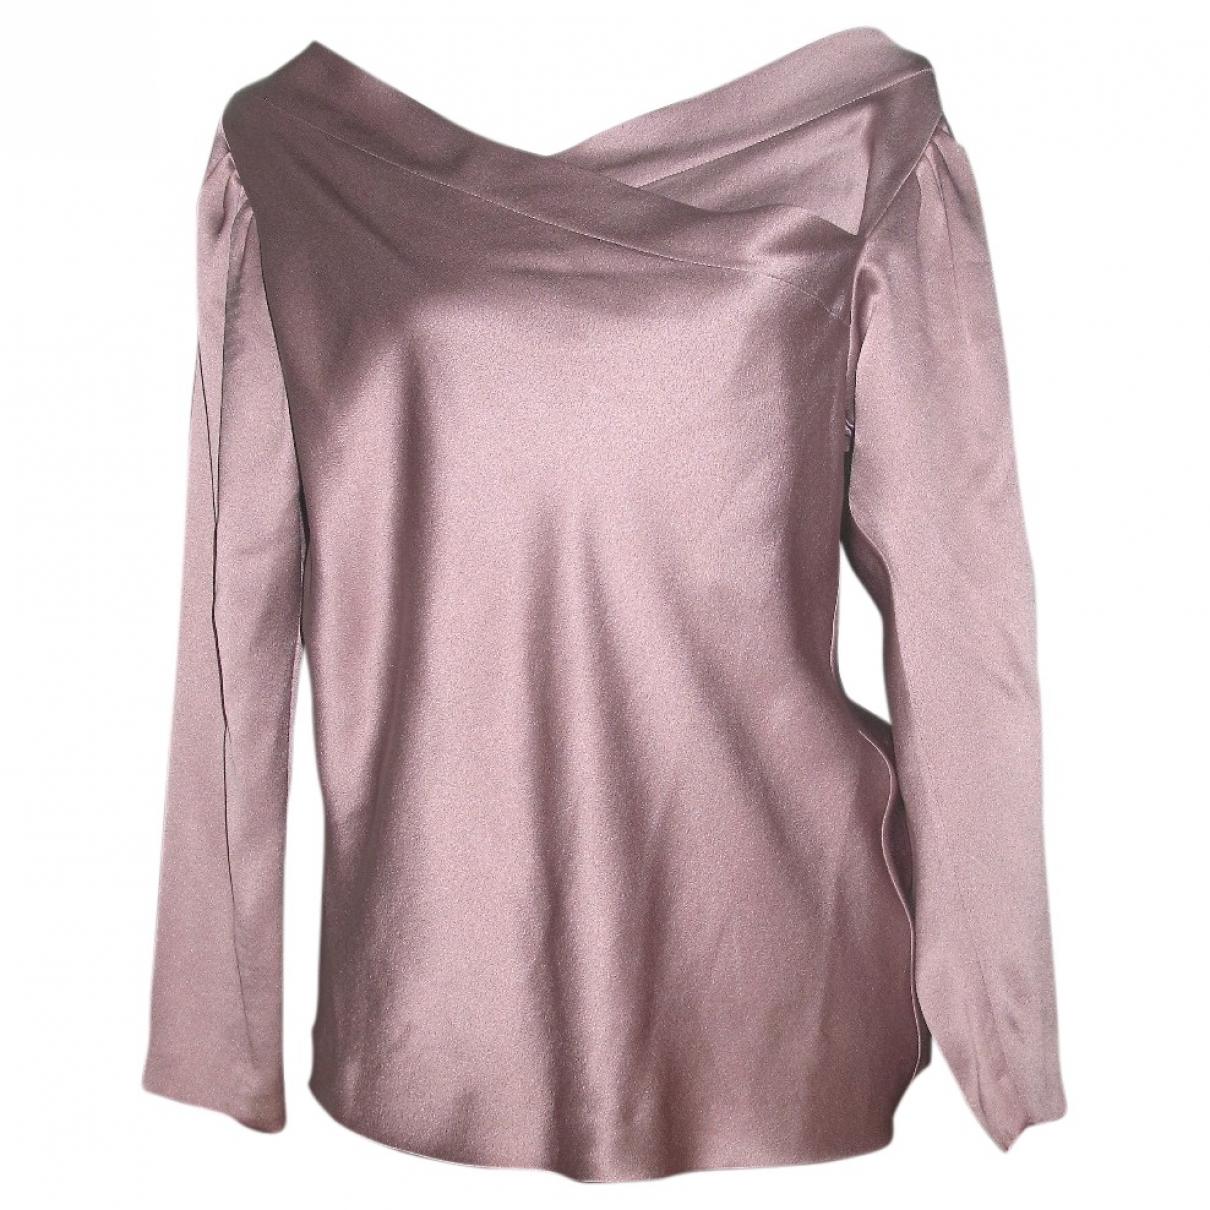 Alberta Ferretti - Top   pour femme en soie - rose